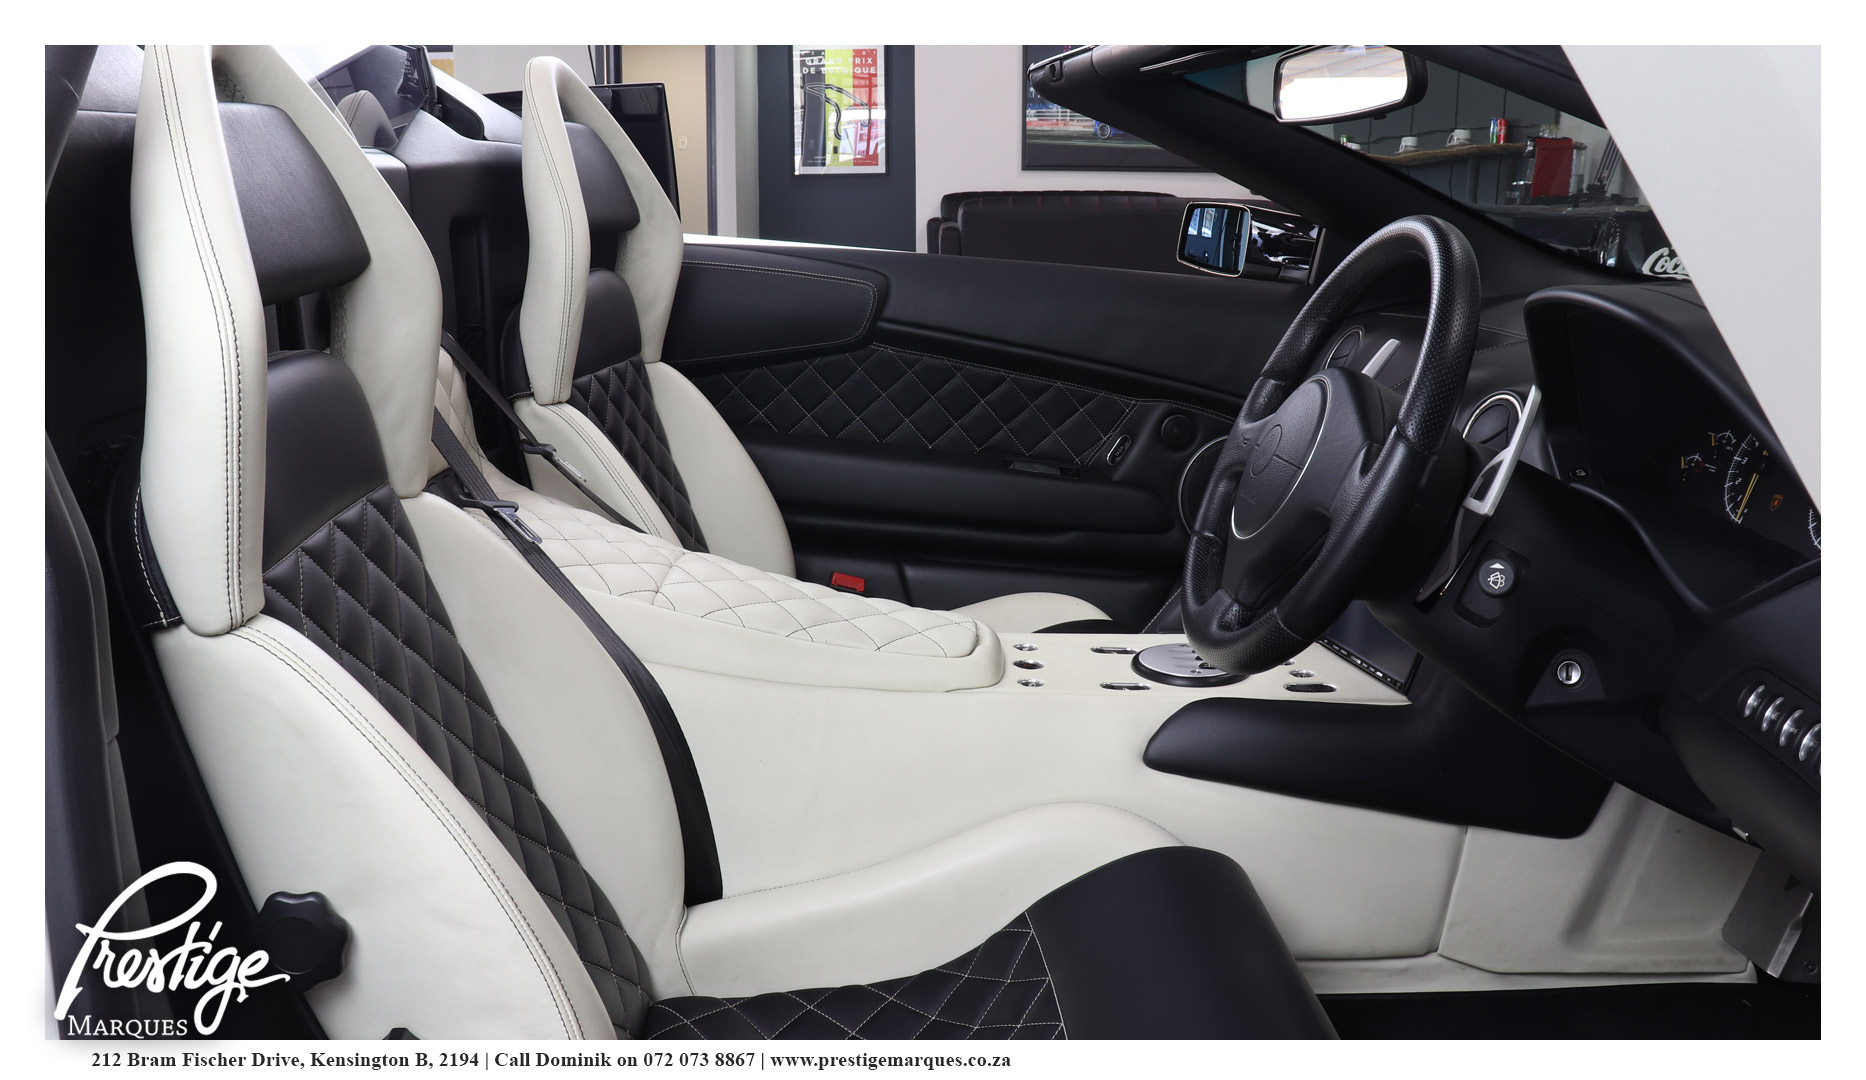 1-2008-Lamborghini-Murcielago-Roadster-LP640-E-Gear-Prestige-Marques-Randburg-Sandton-15